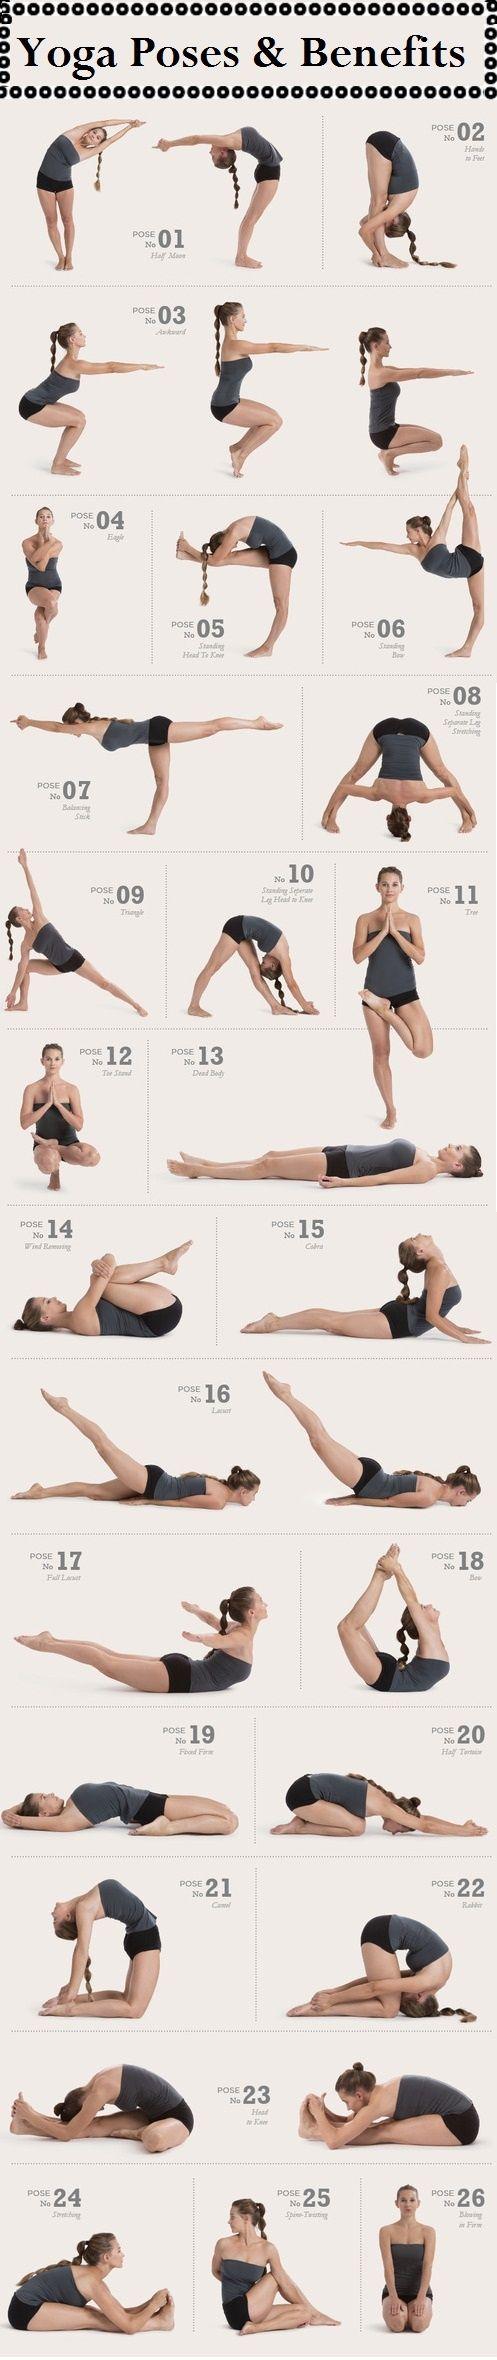 26 Yoga Poses + Benefits